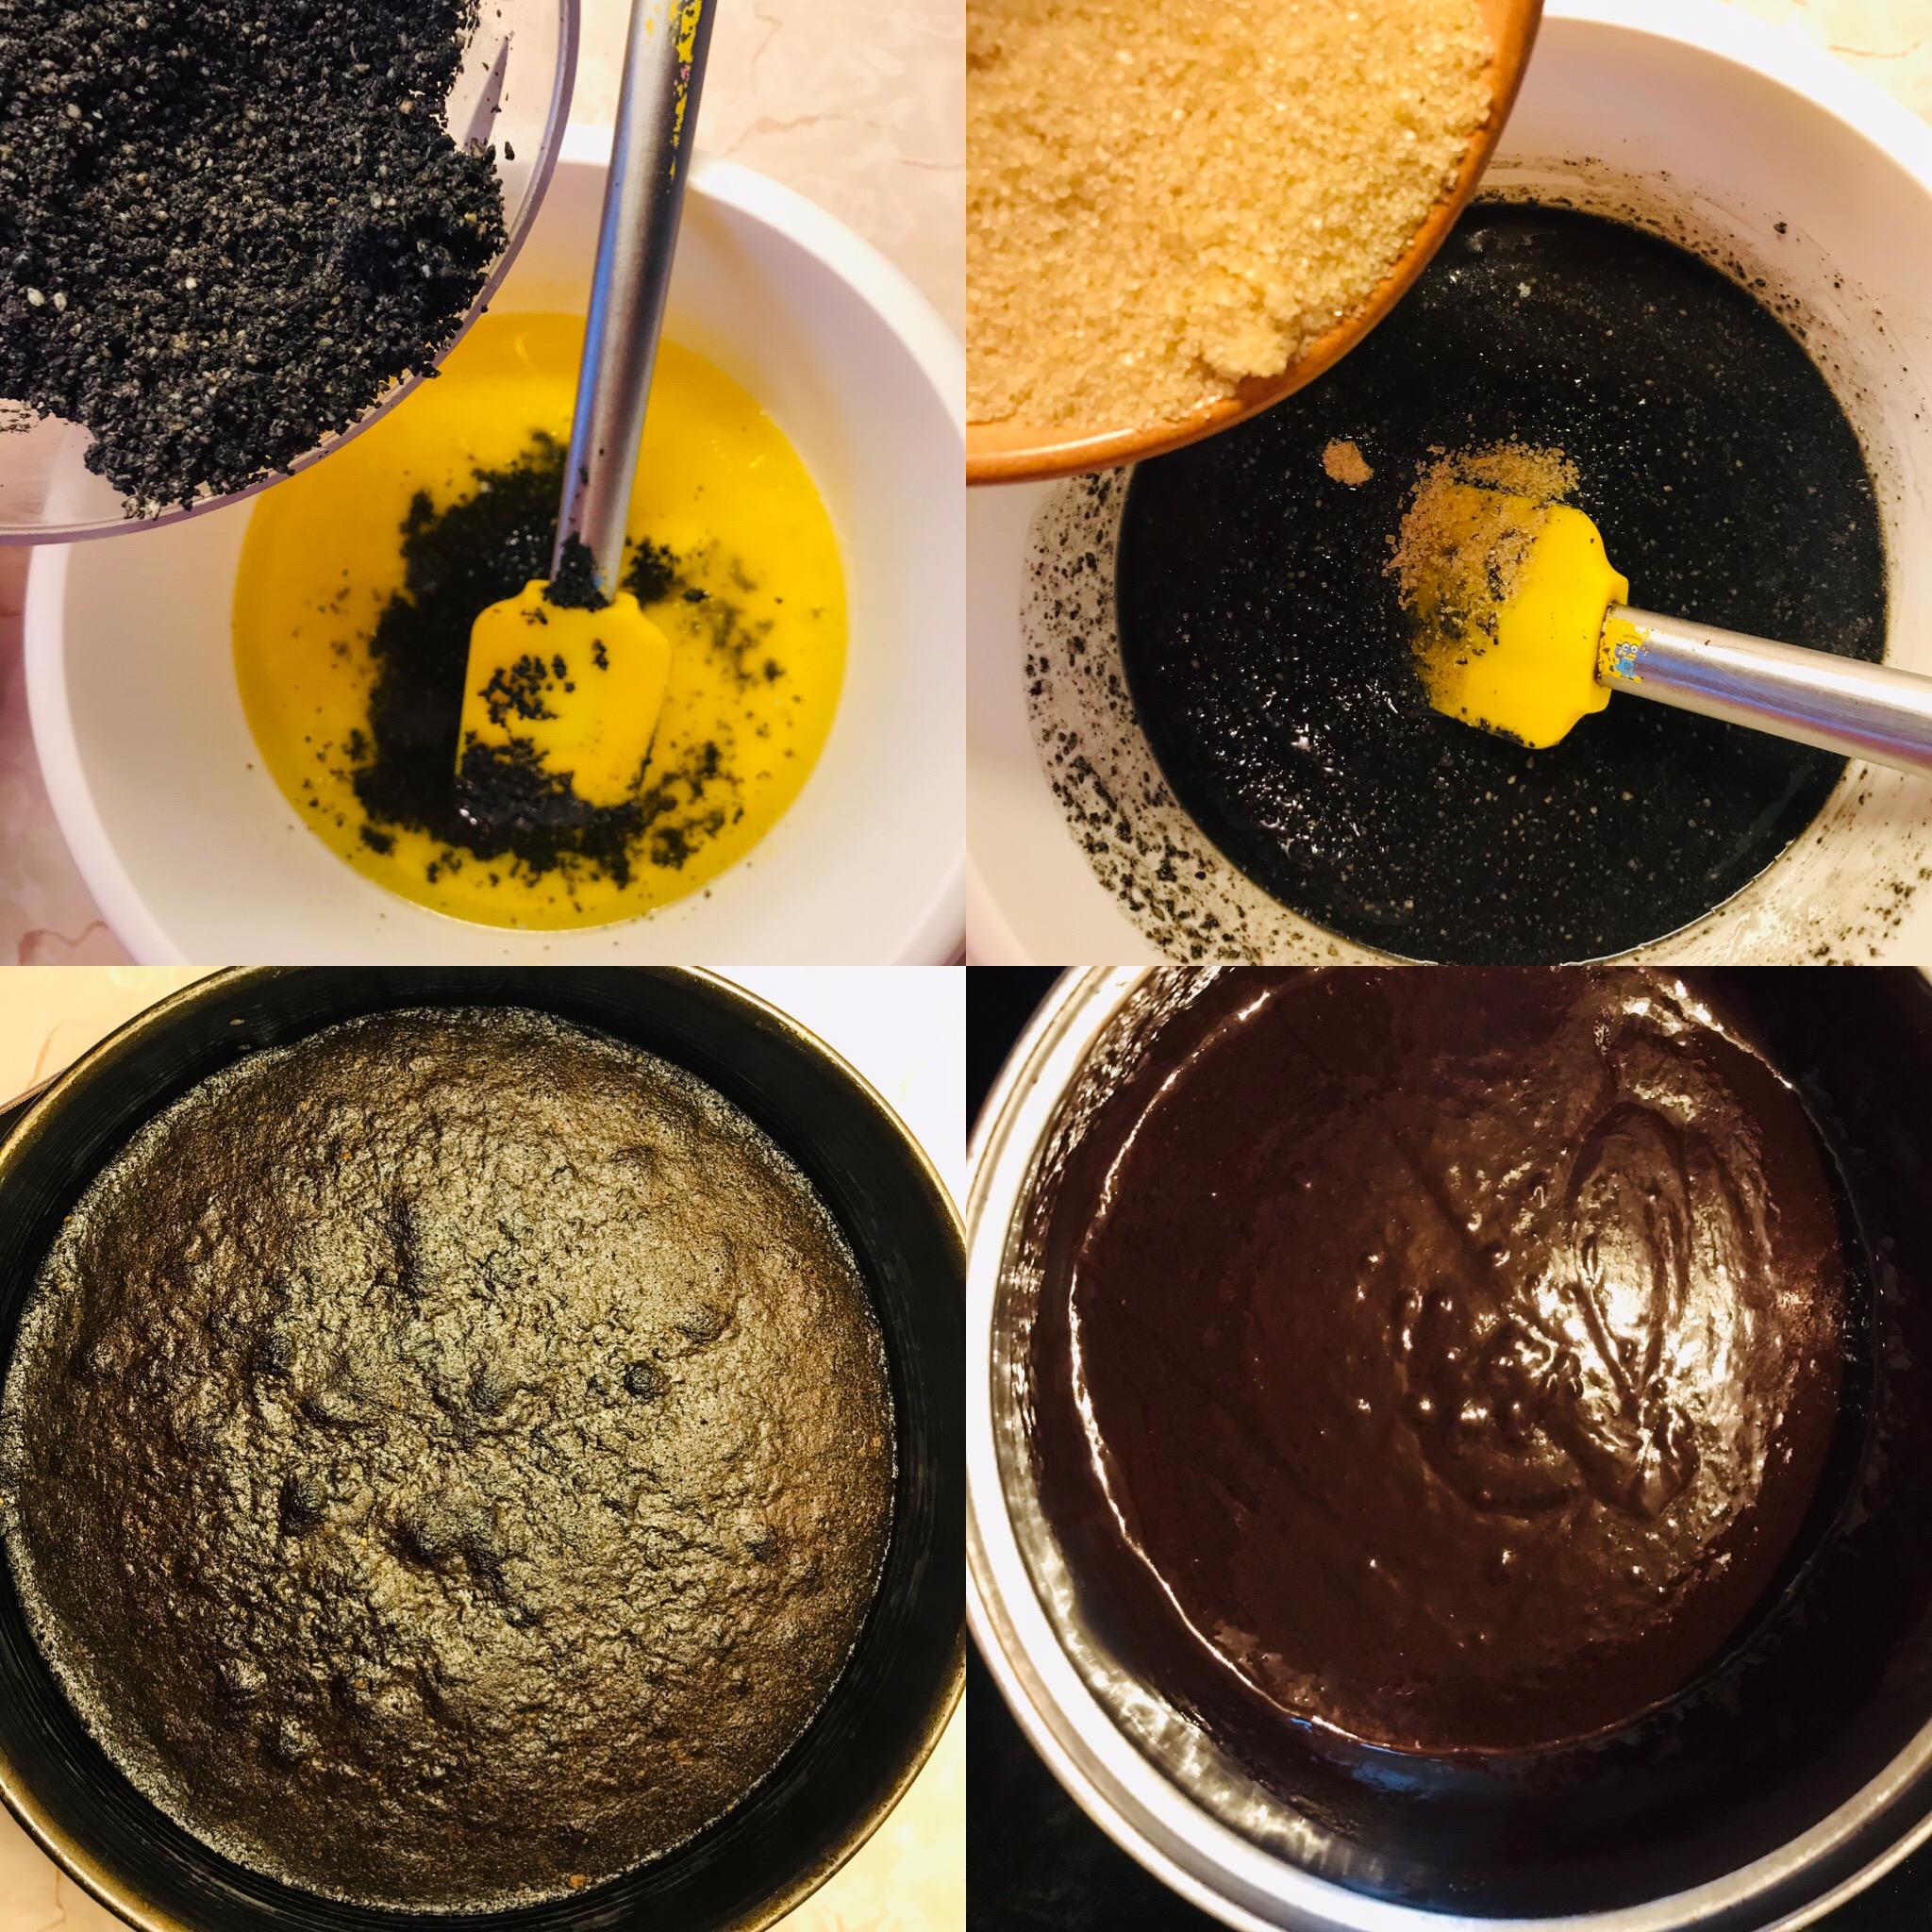 fekete_szezammag_torta1.JPG